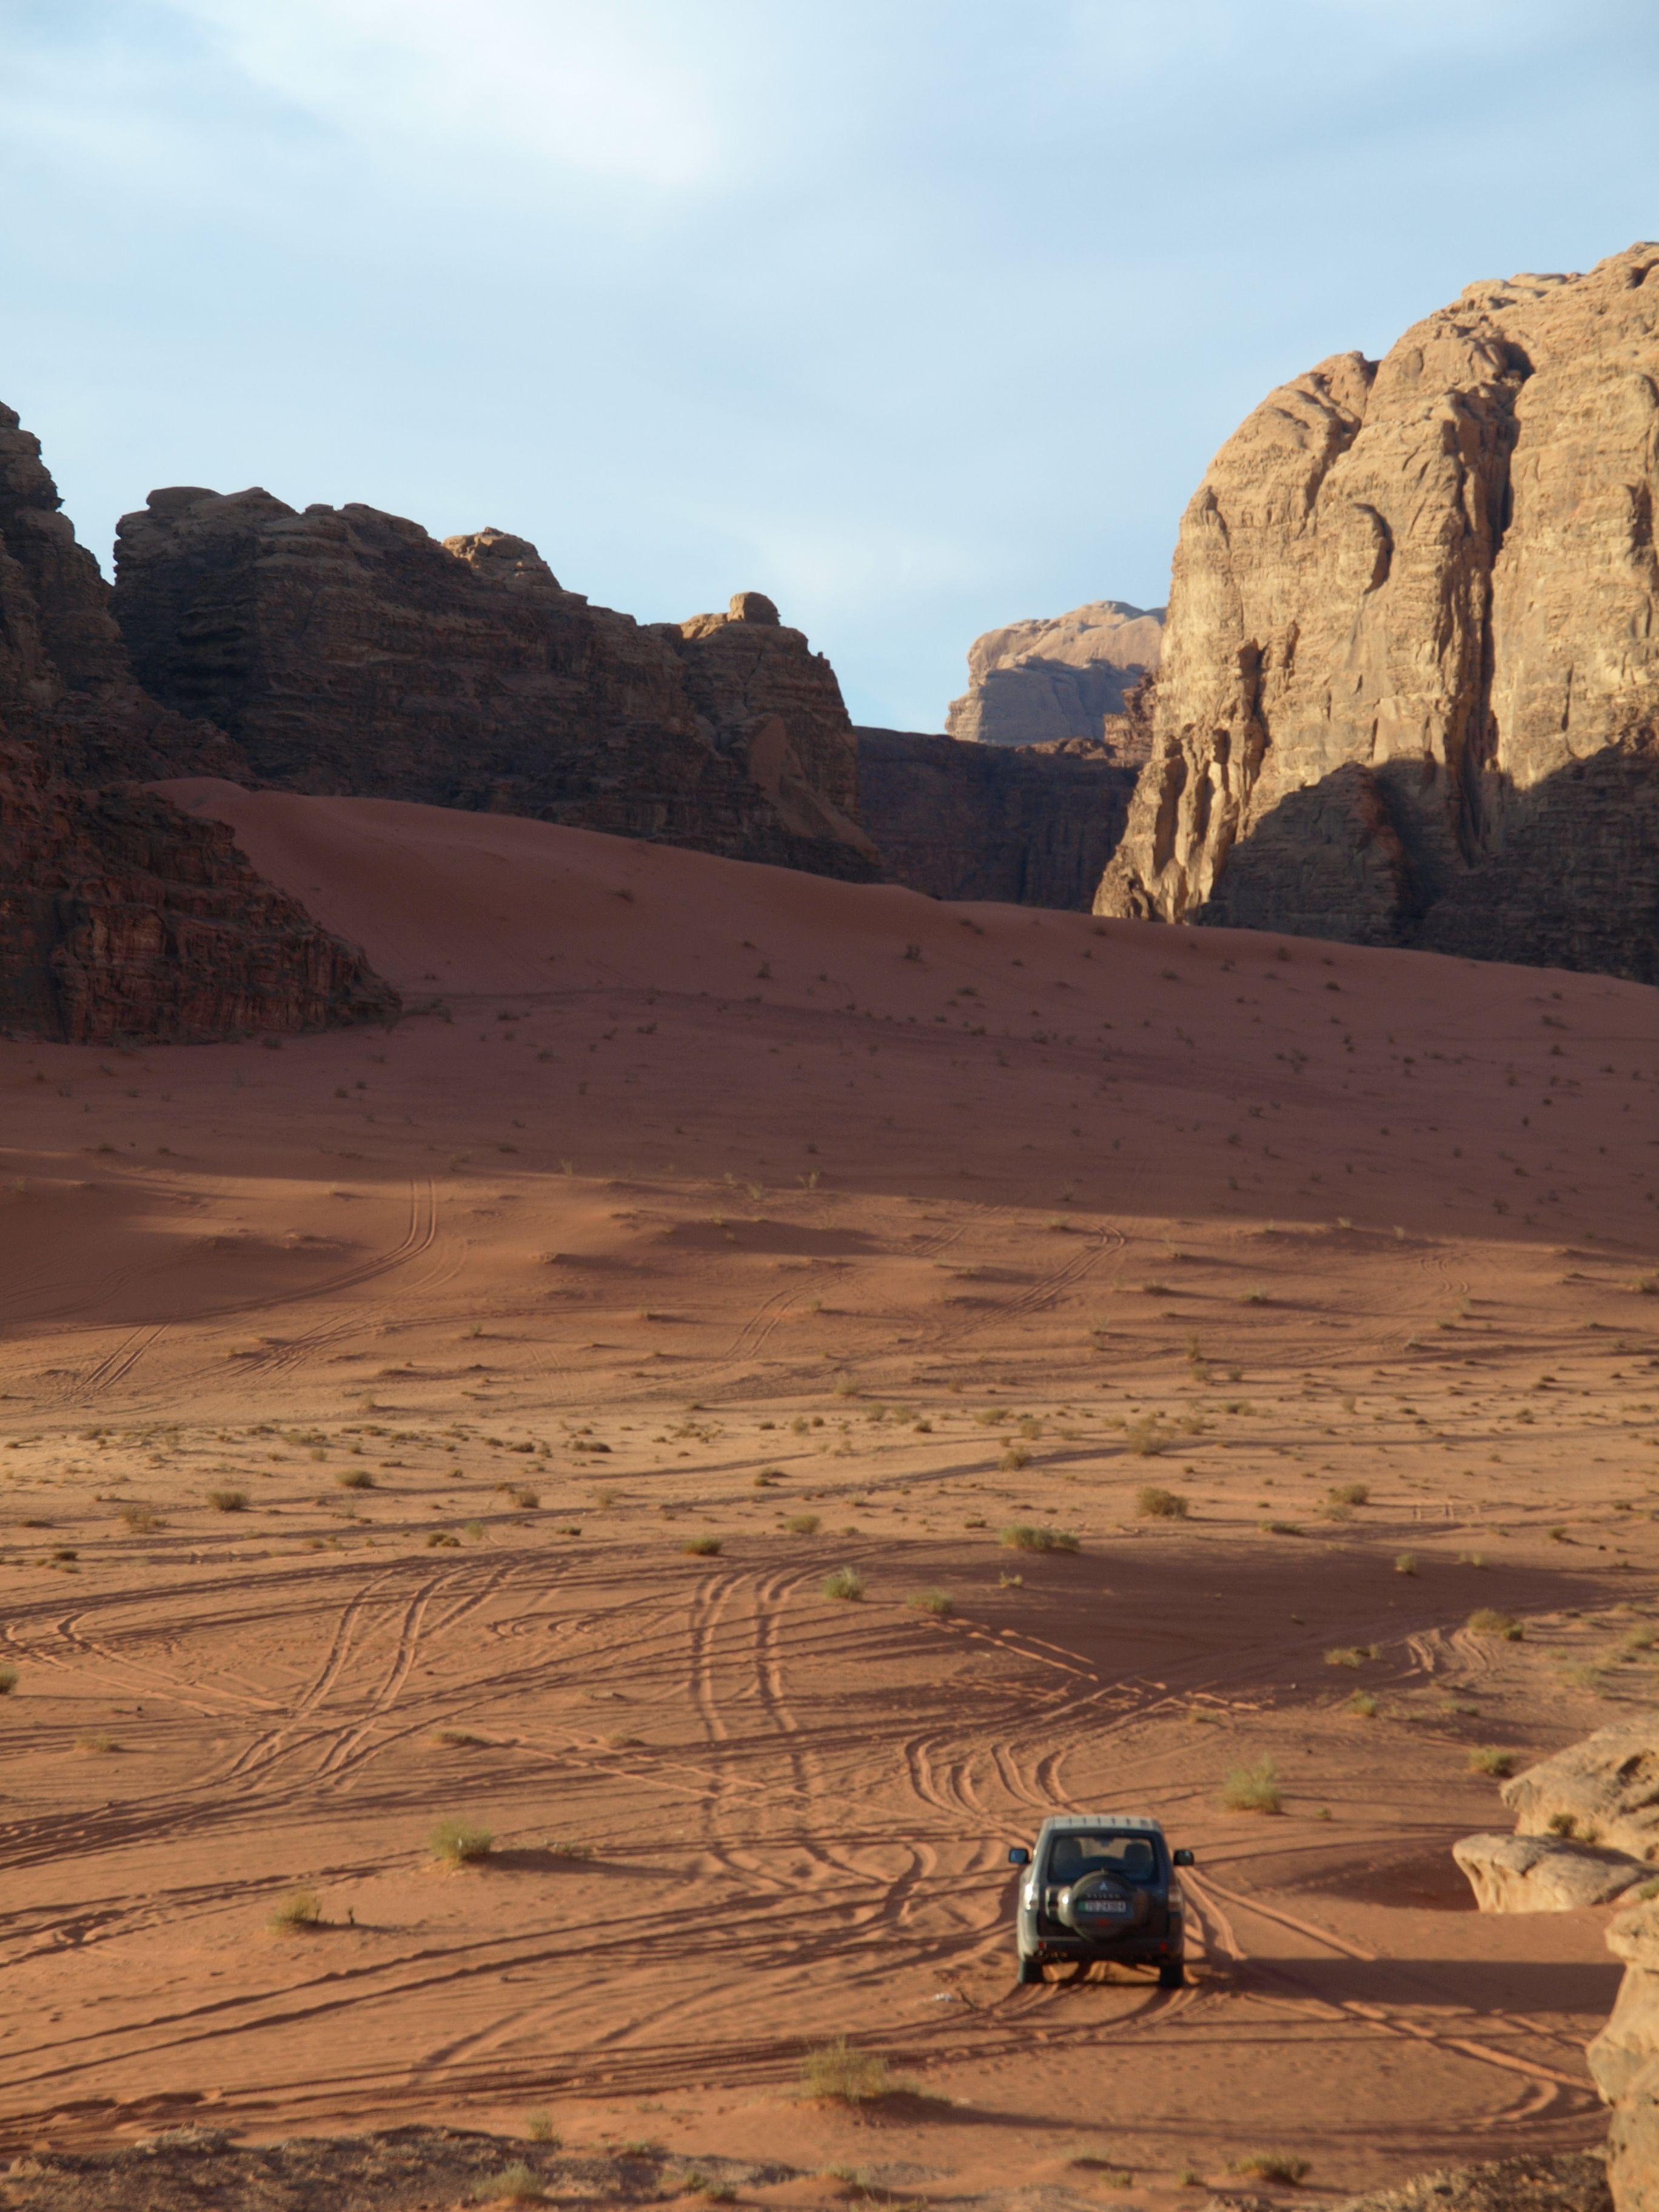 Route Wadi Rum to Aqaba